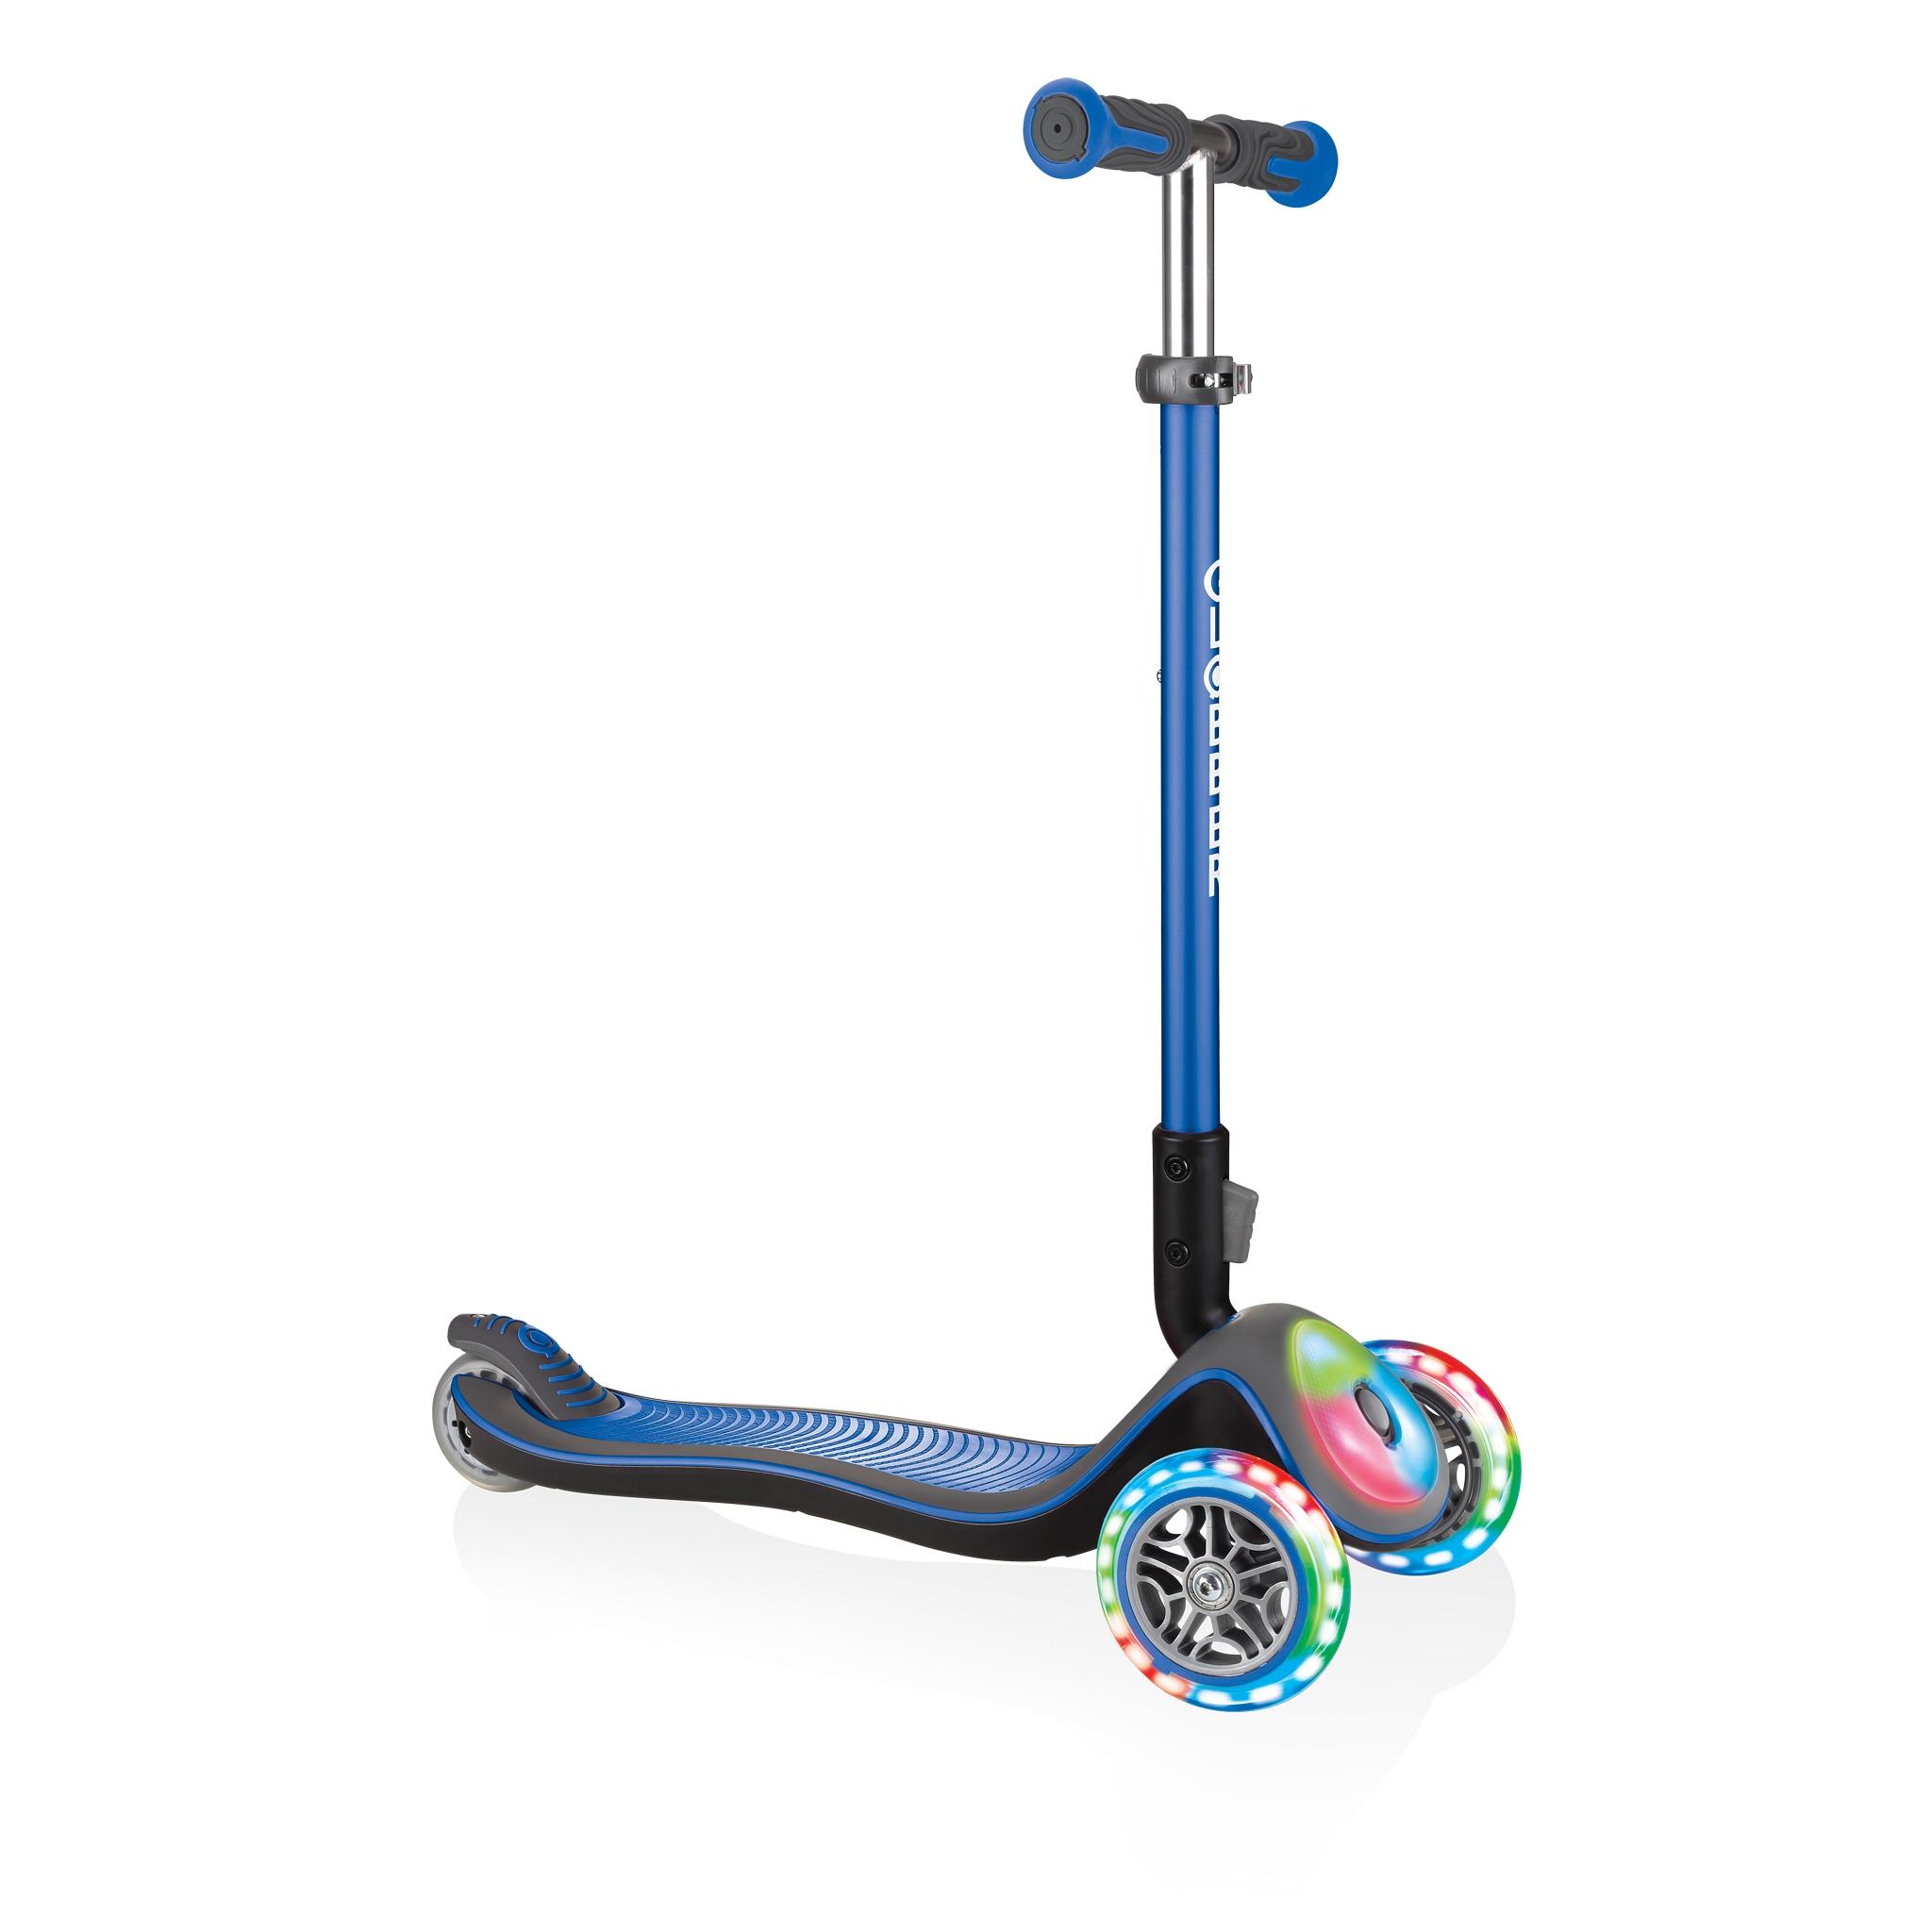 Globber-ELITE-DELUXE-FLASH-LIGHTS-3-wheel-light-up-scooter-for-kids-aged-3+-navy-blue 0